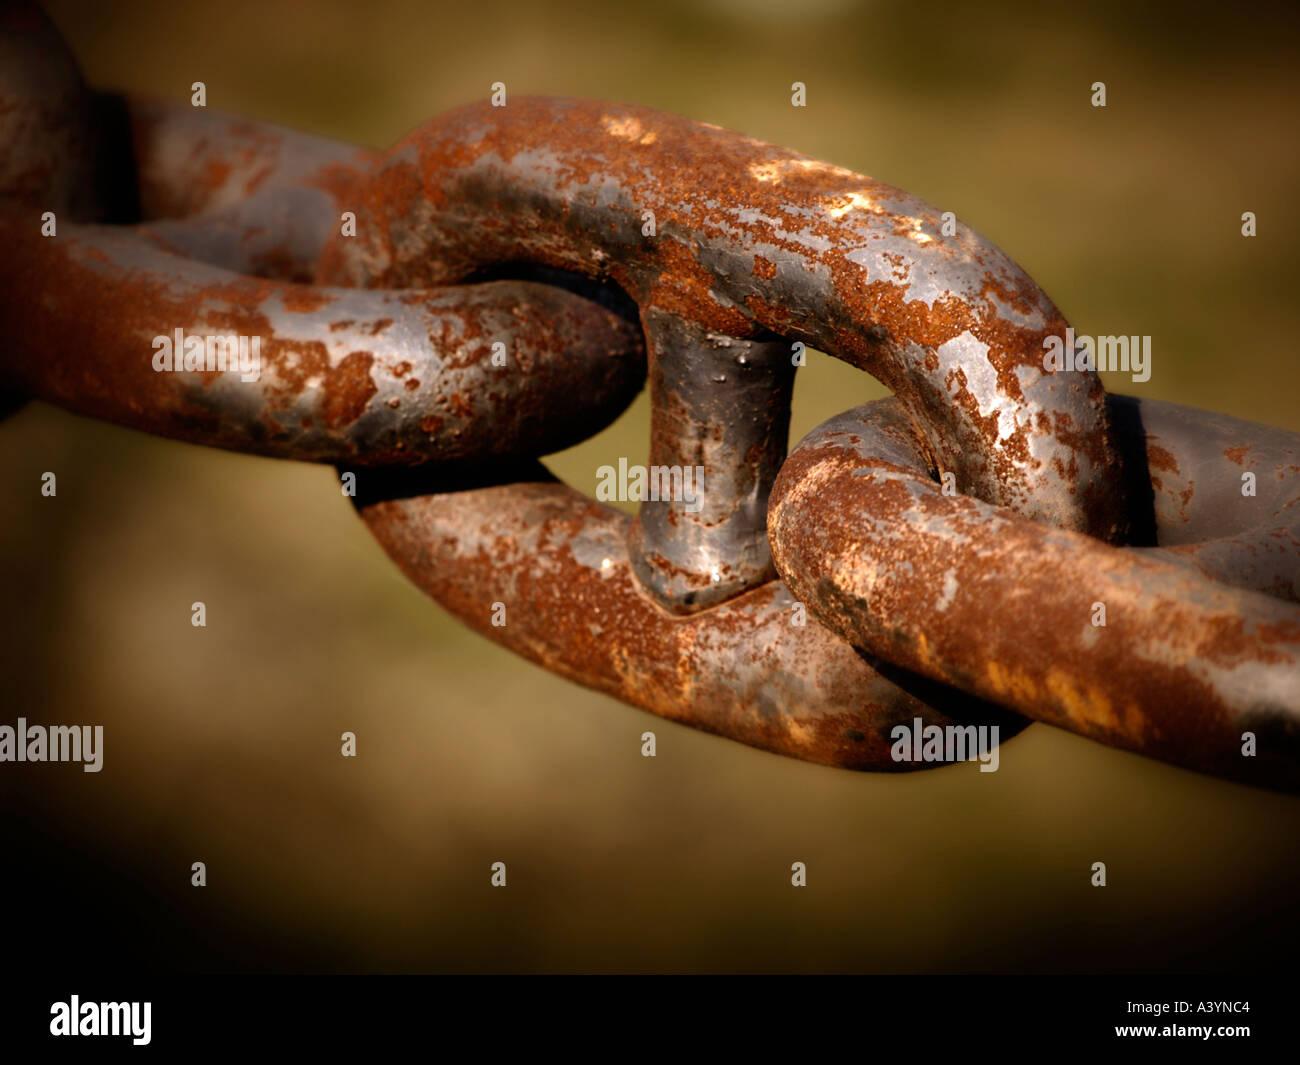 Rusty link de gigantescos buques cadena Imagen De Stock